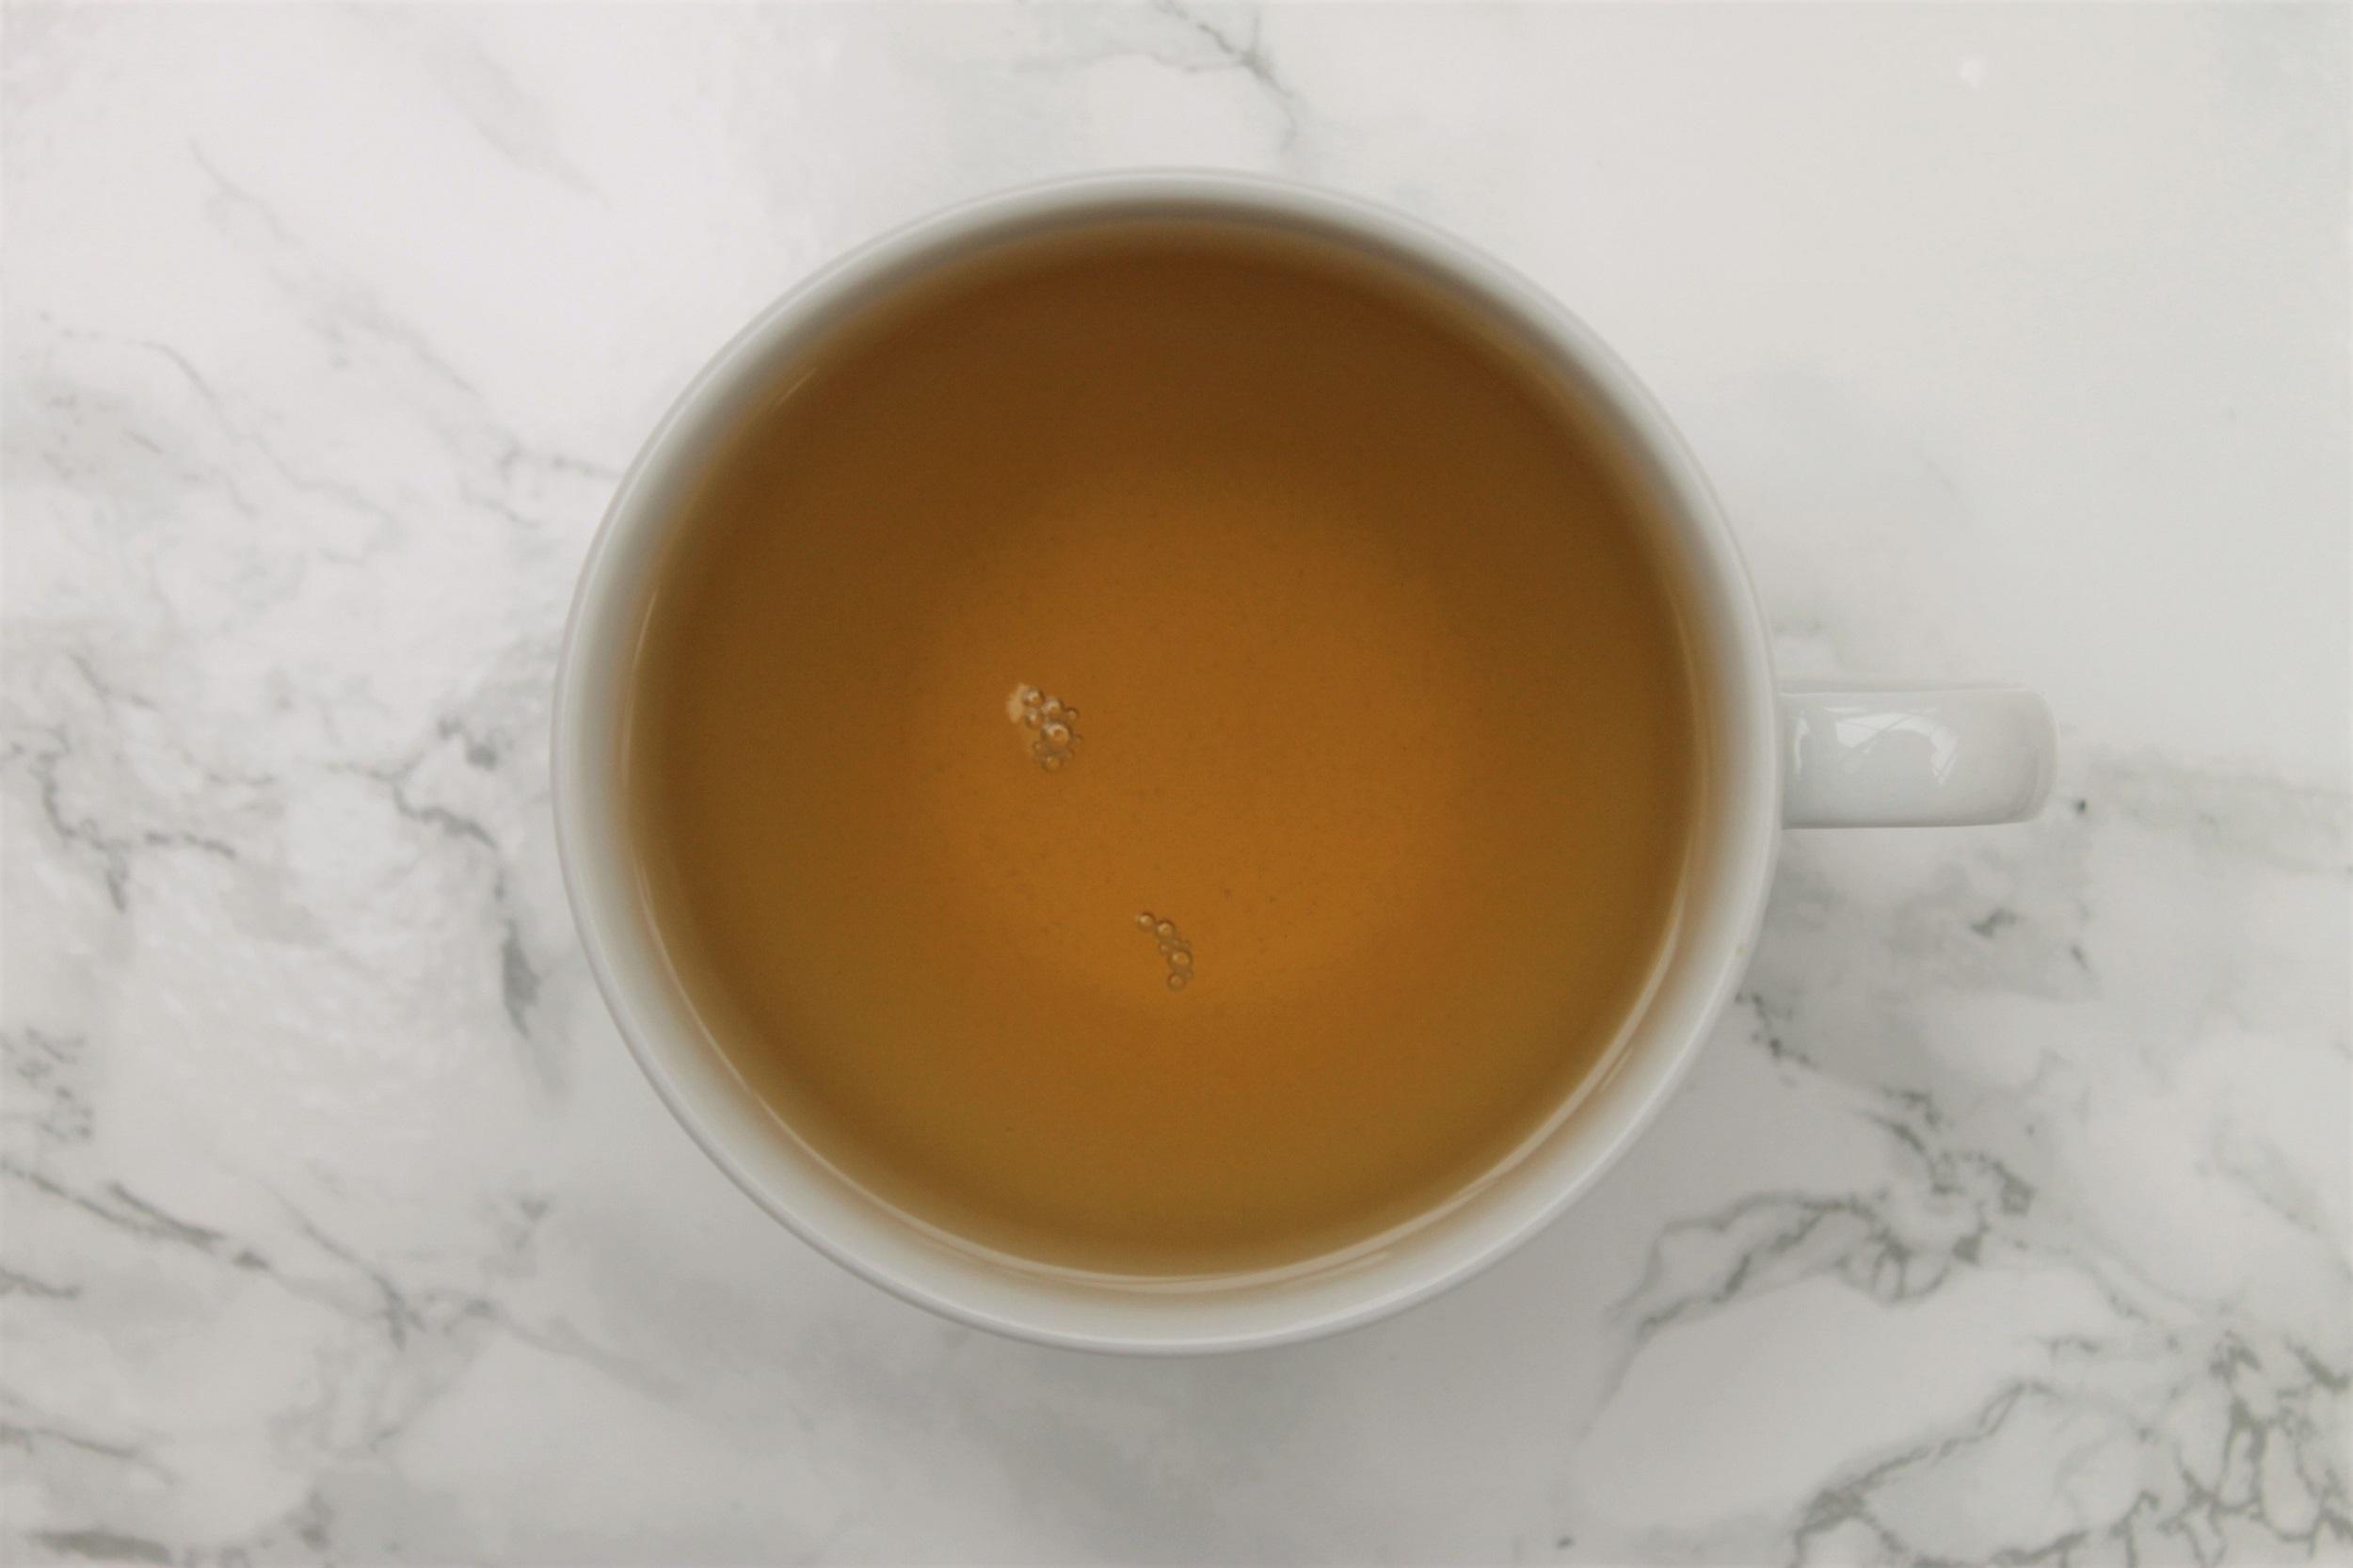 t2 sencha green tea in white teacup